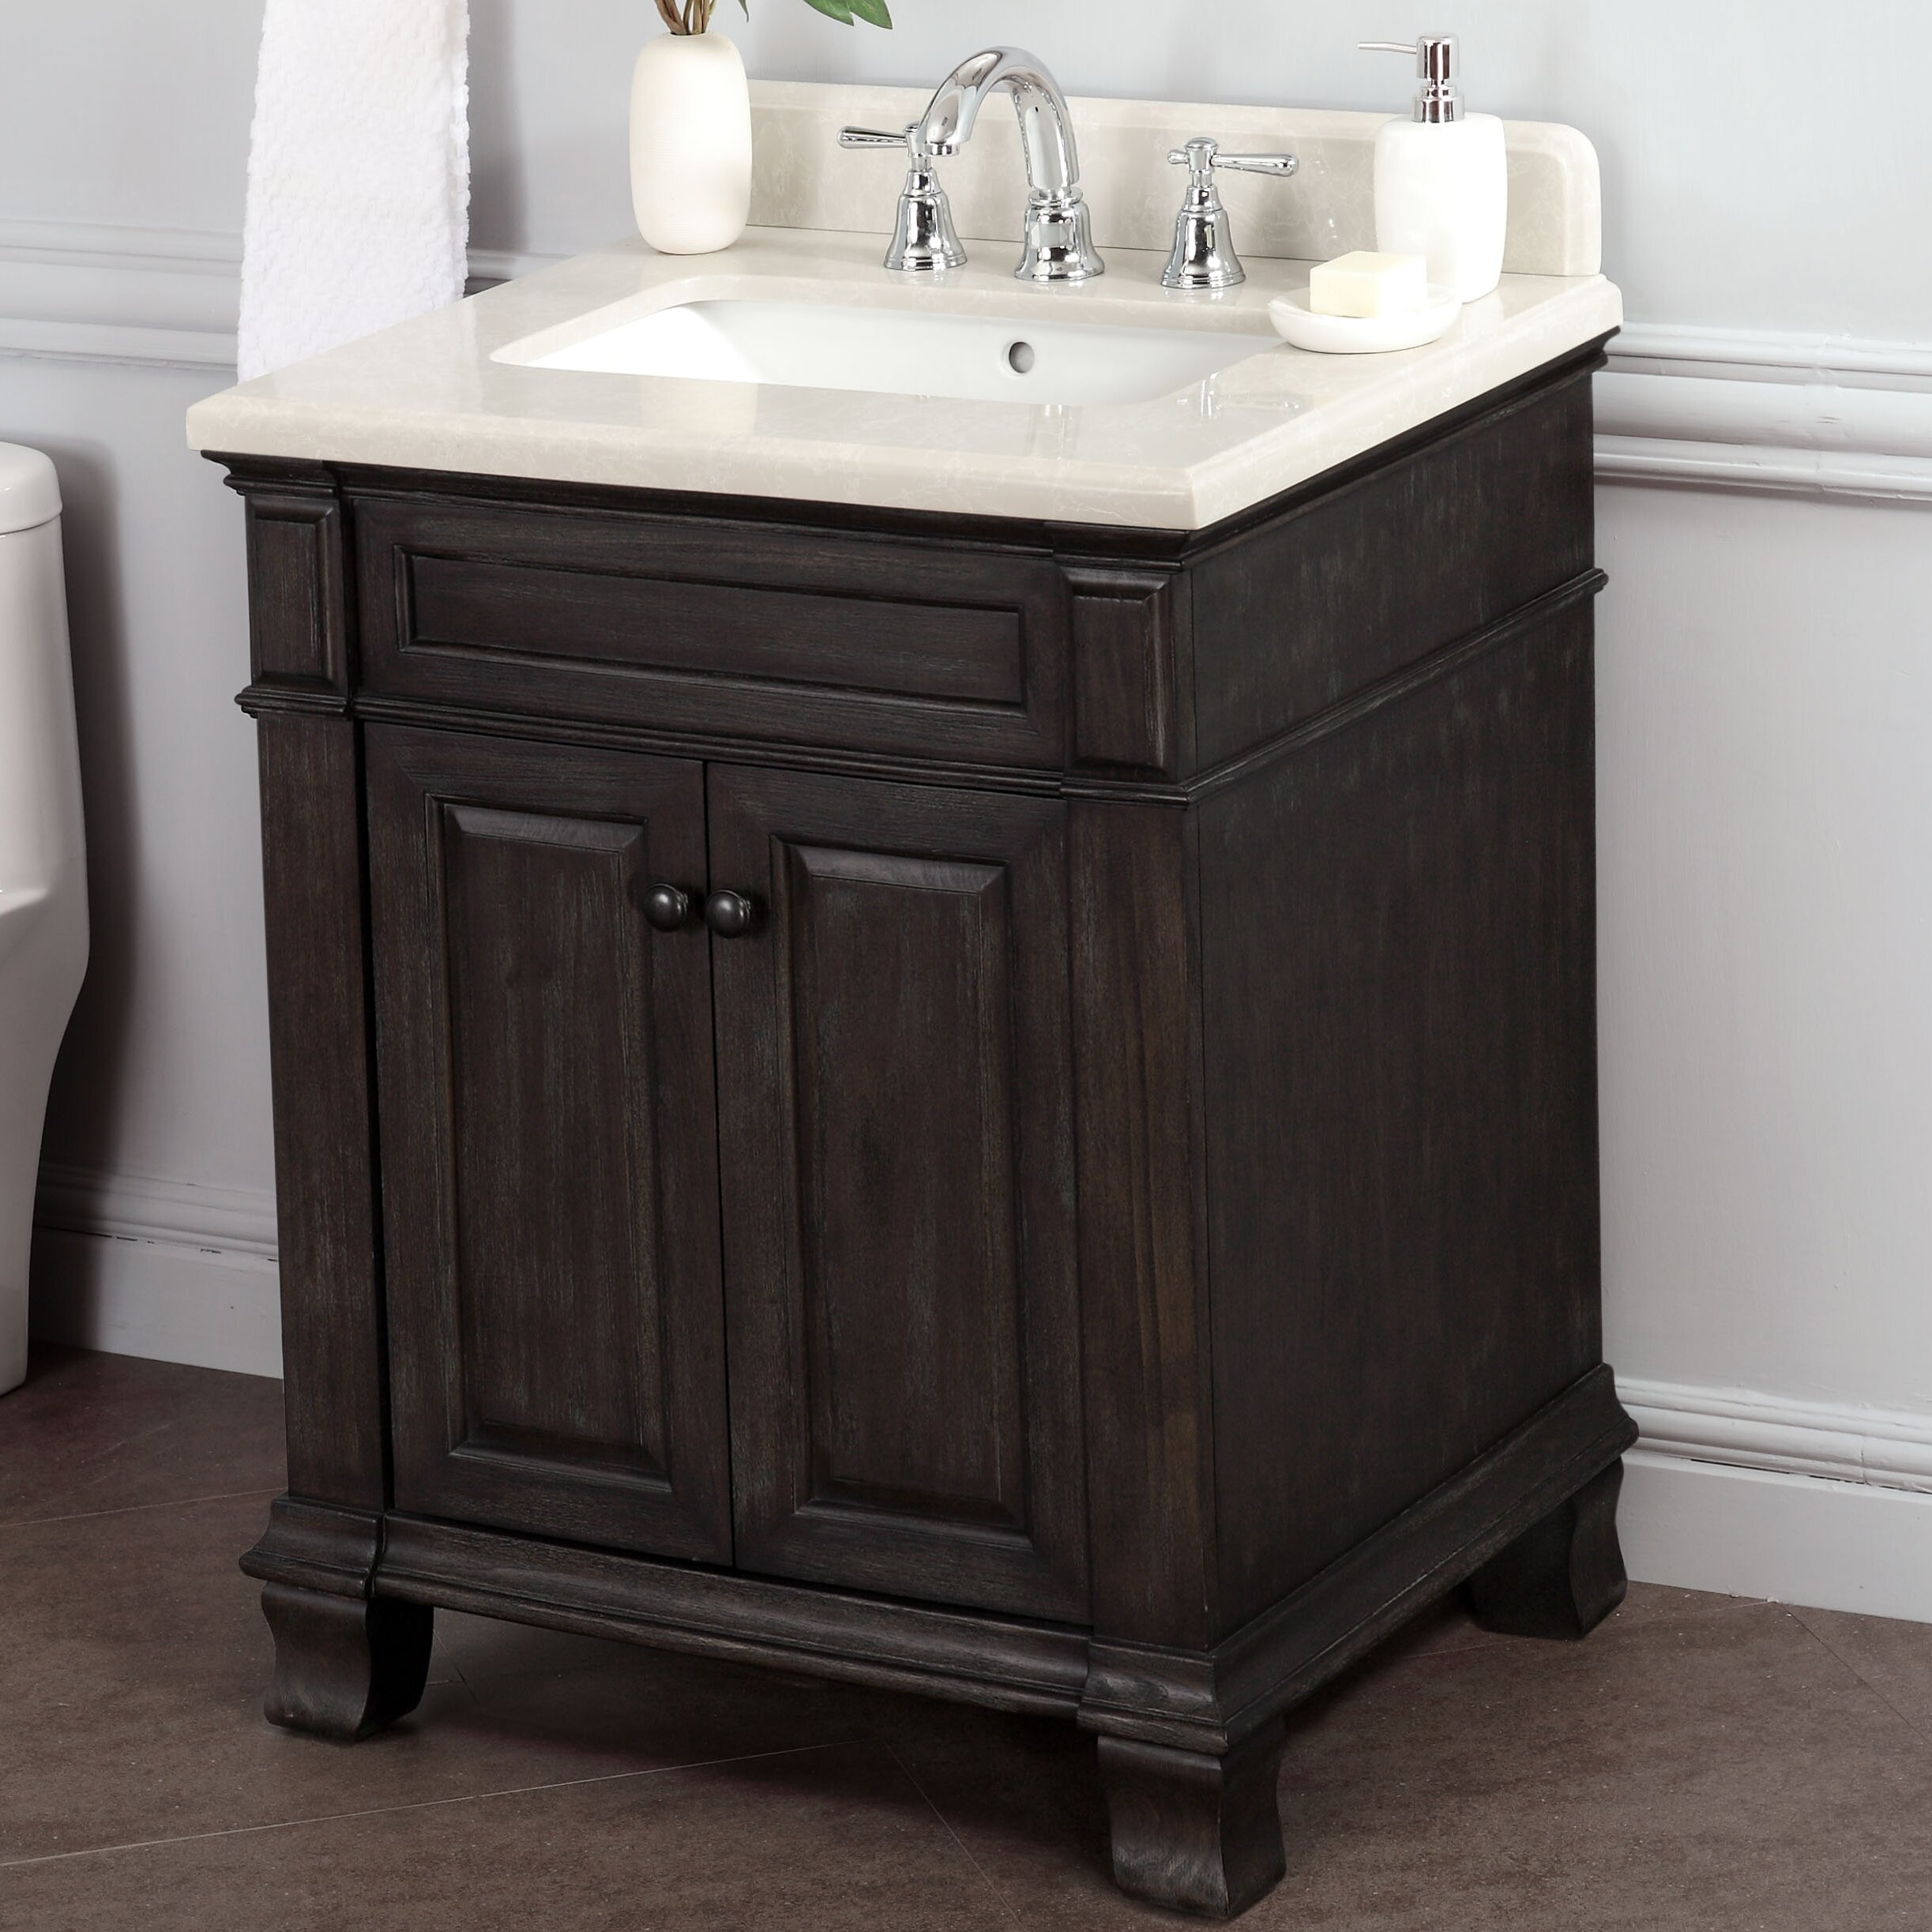 28 Inch Bathroom Vanity Amazing Design